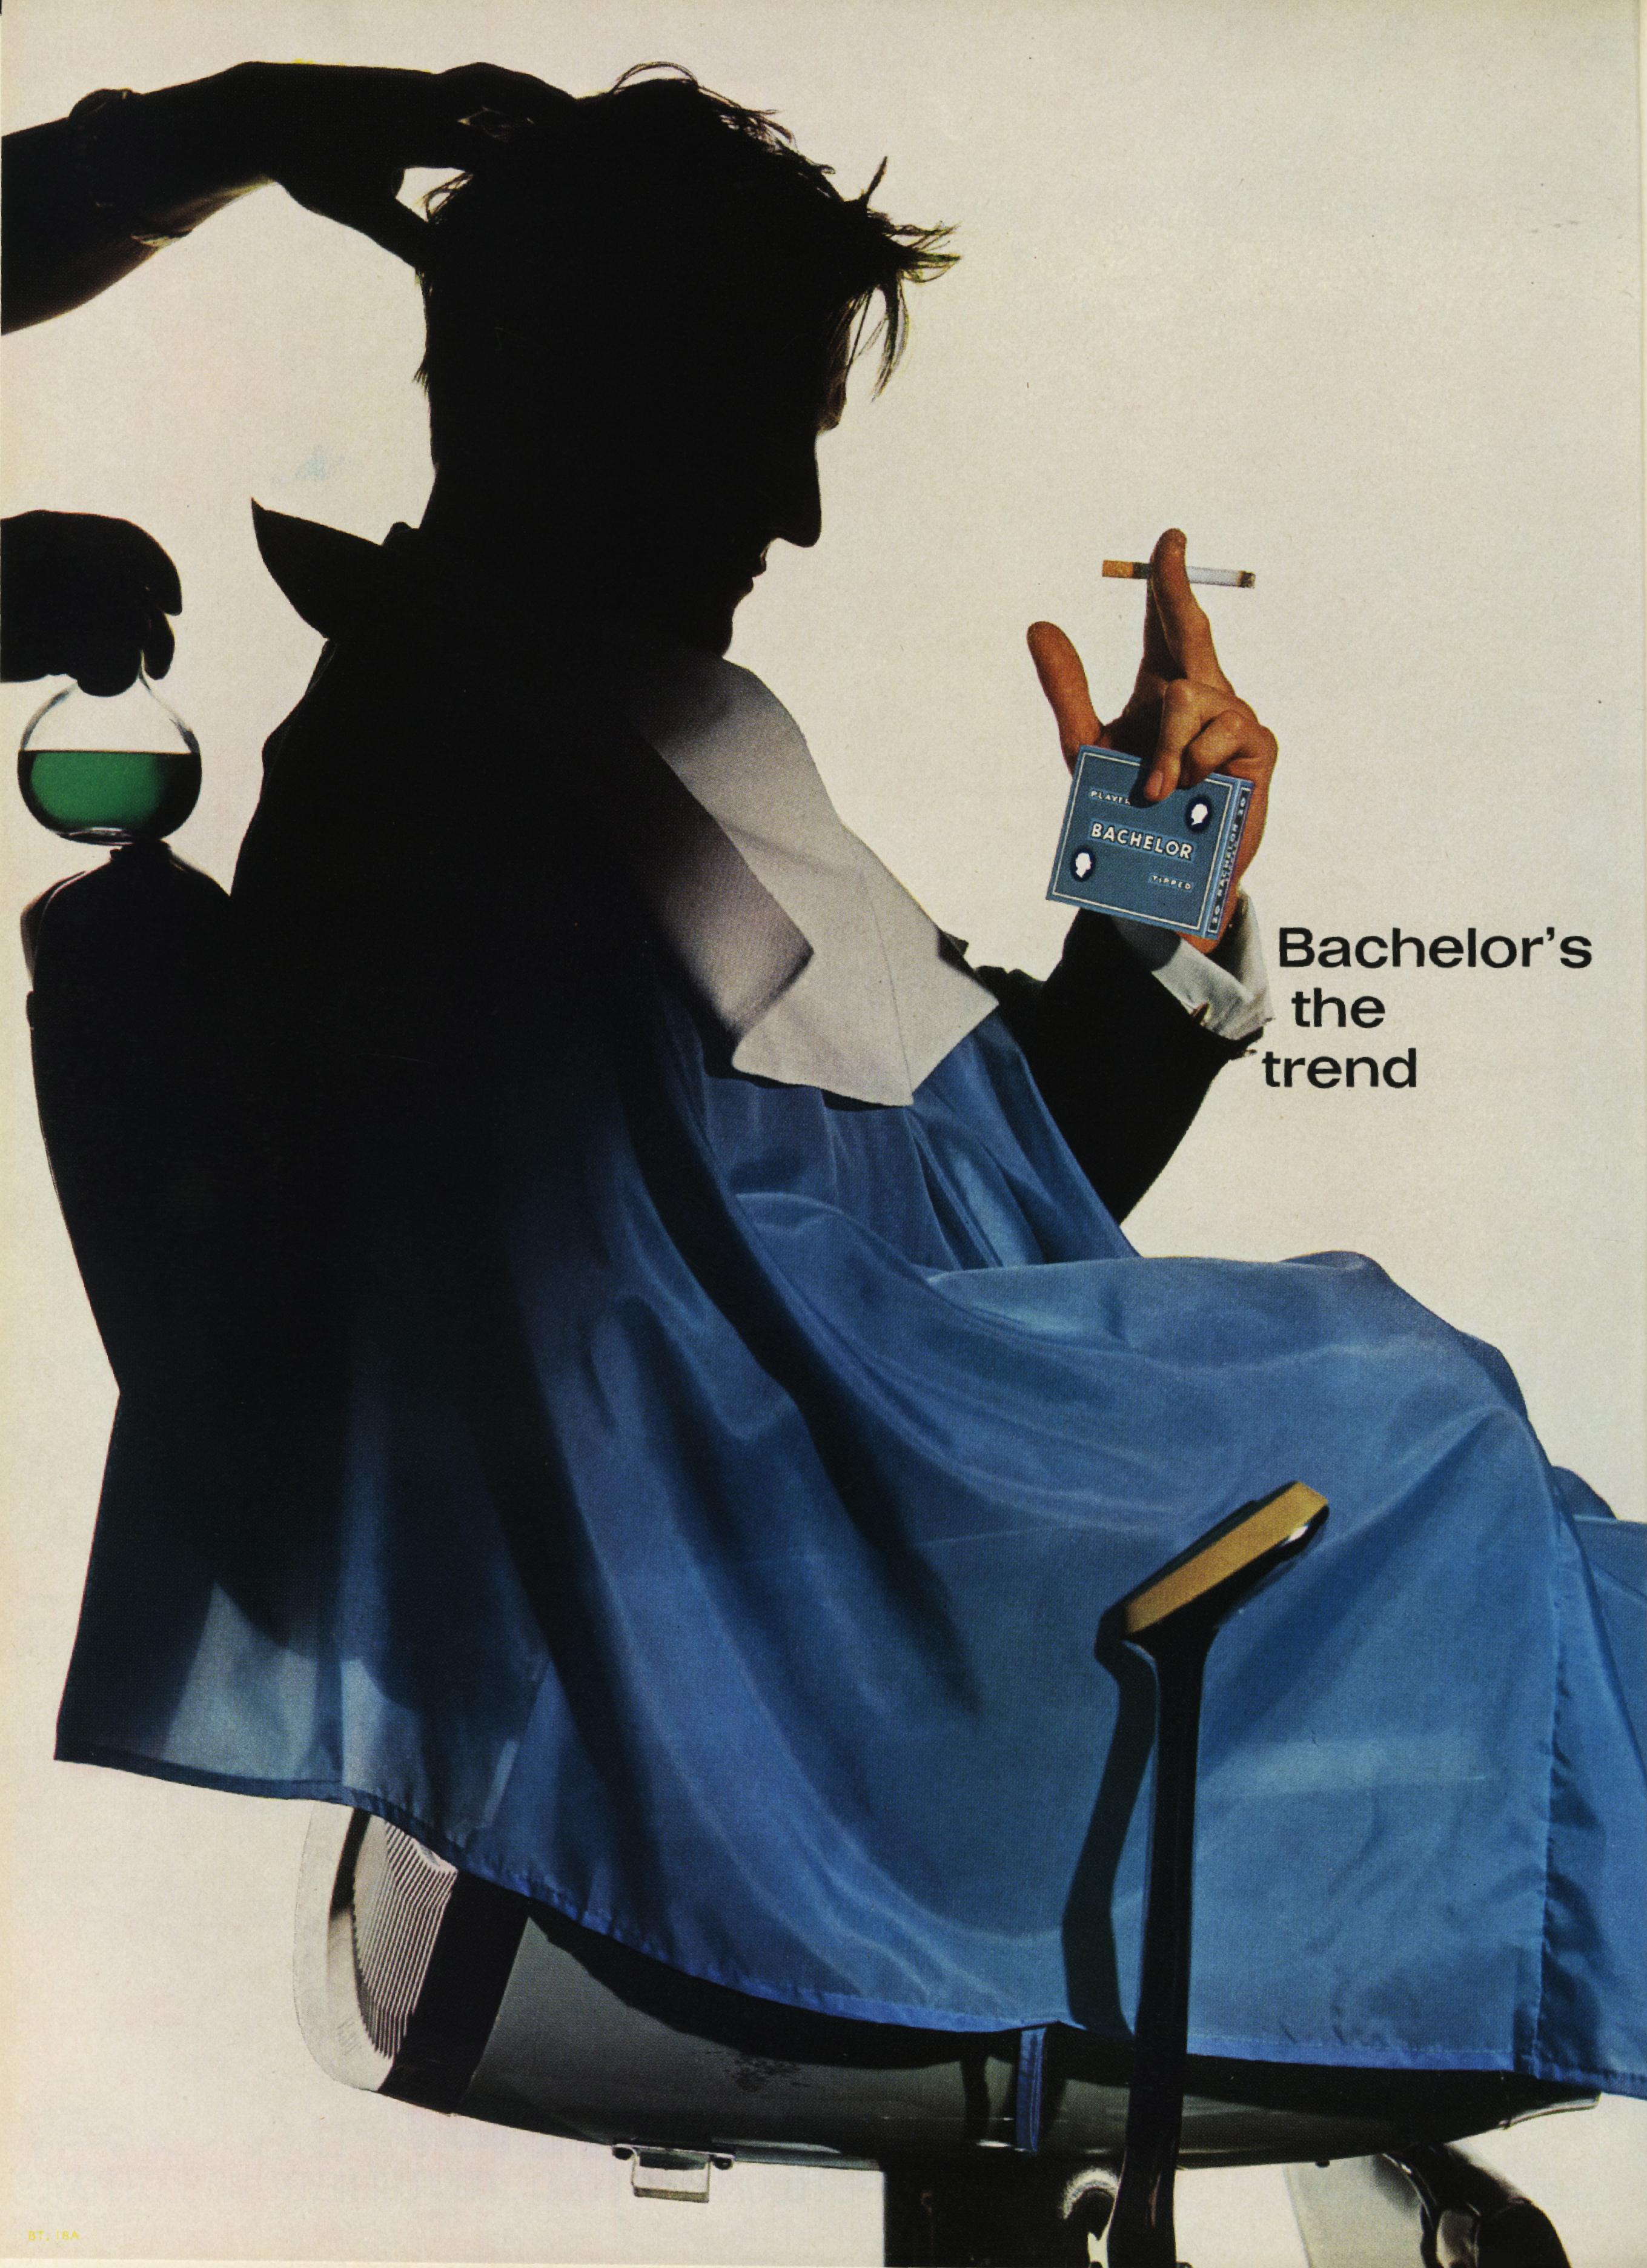 Lester Bookbinder, Bachelors Cigarettes - 'Barbers'-01